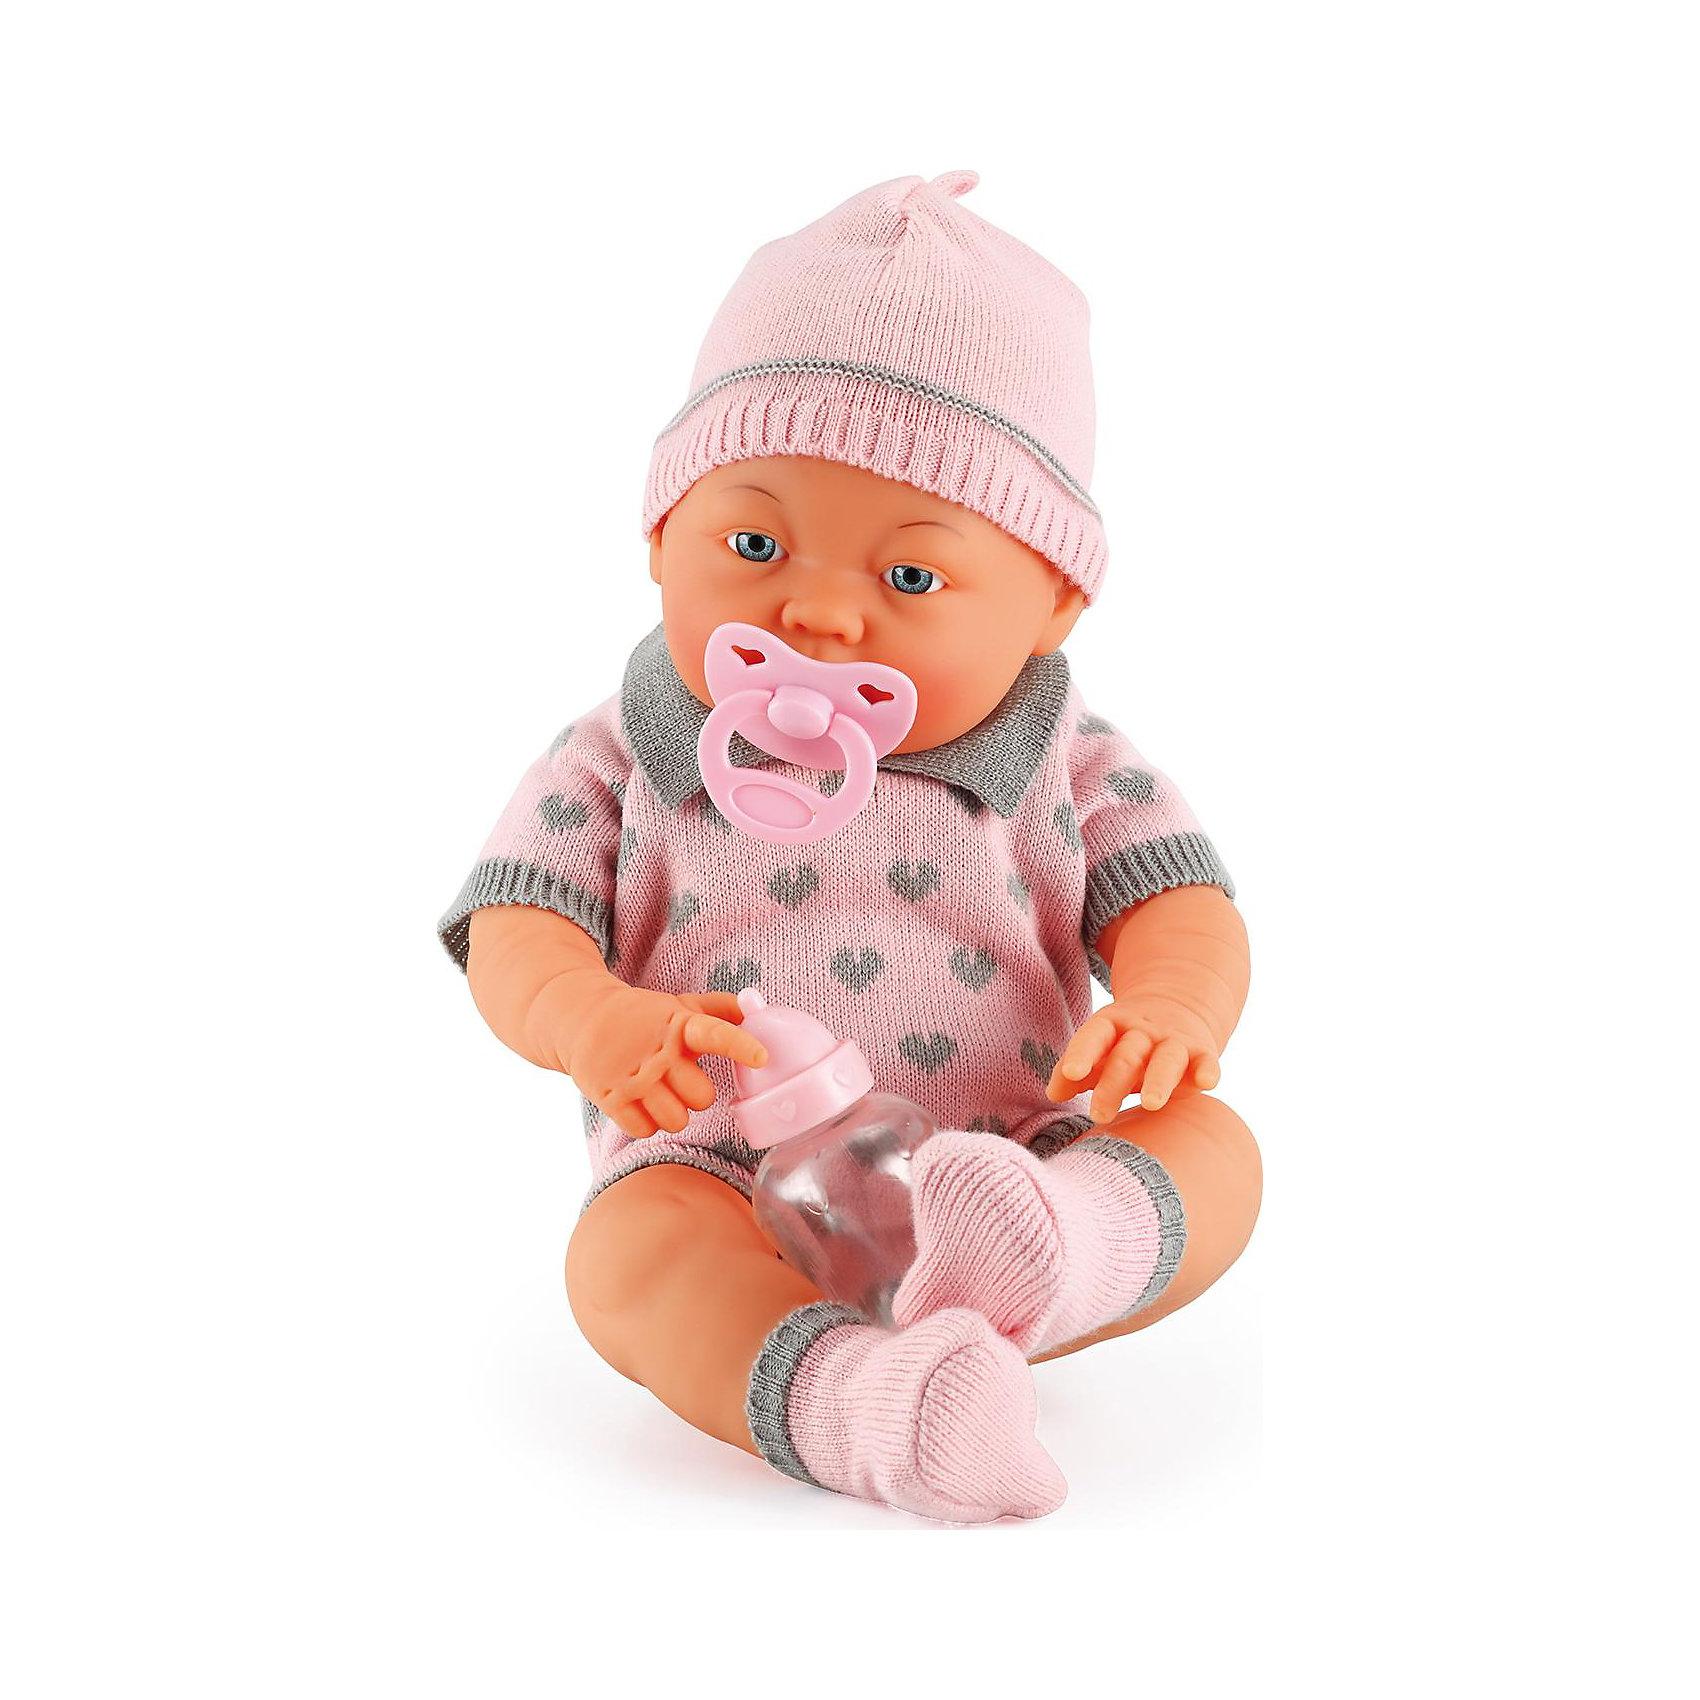 BAYER Малышка Бамбина 42см куклы и одежда для кукол bayer малышка первый поцелуй 42 см